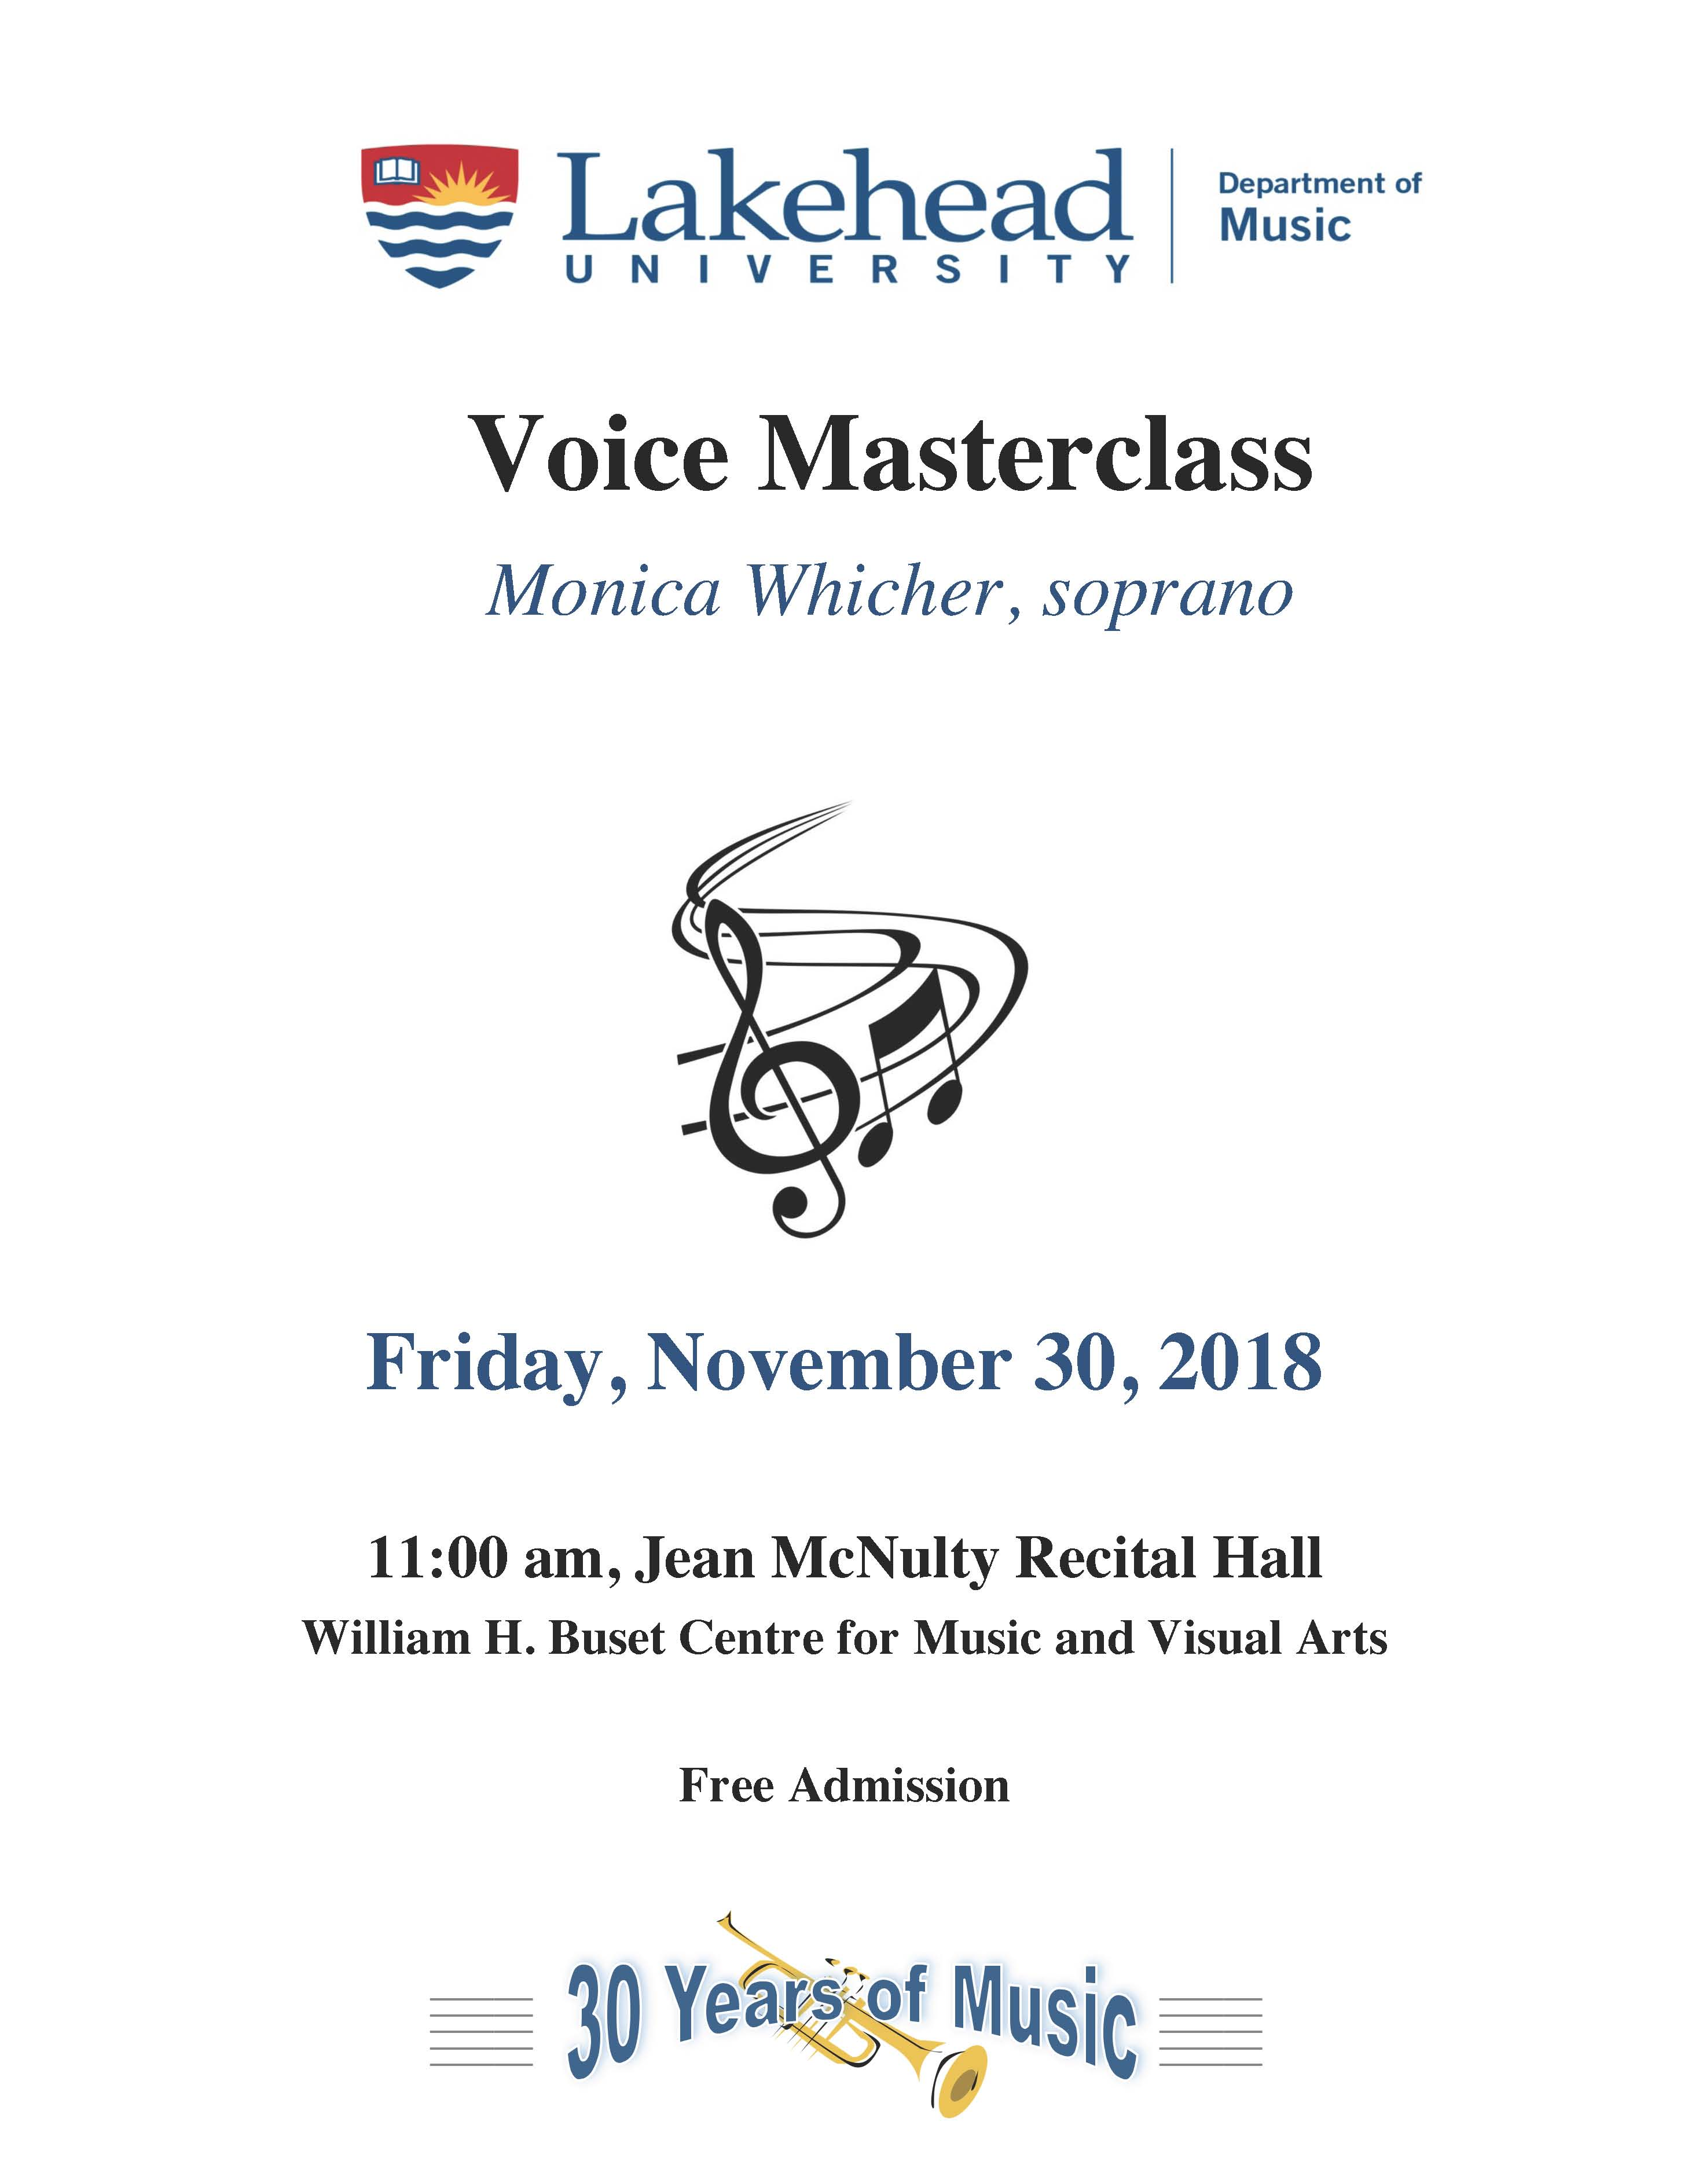 Voice Masterclass